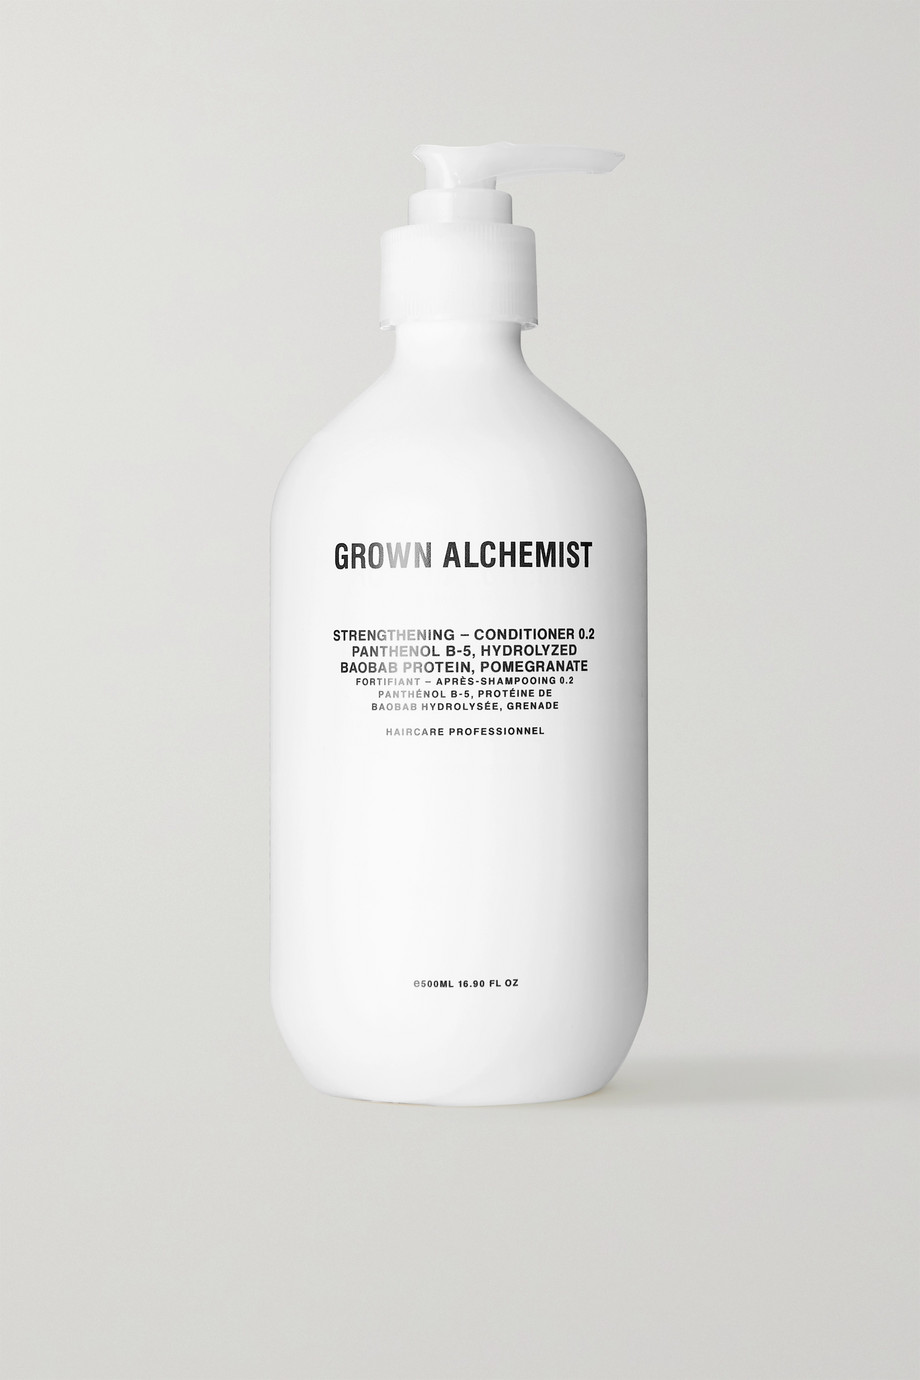 Grown Alchemist Strengthening - Conditioner 0.2, 500ml